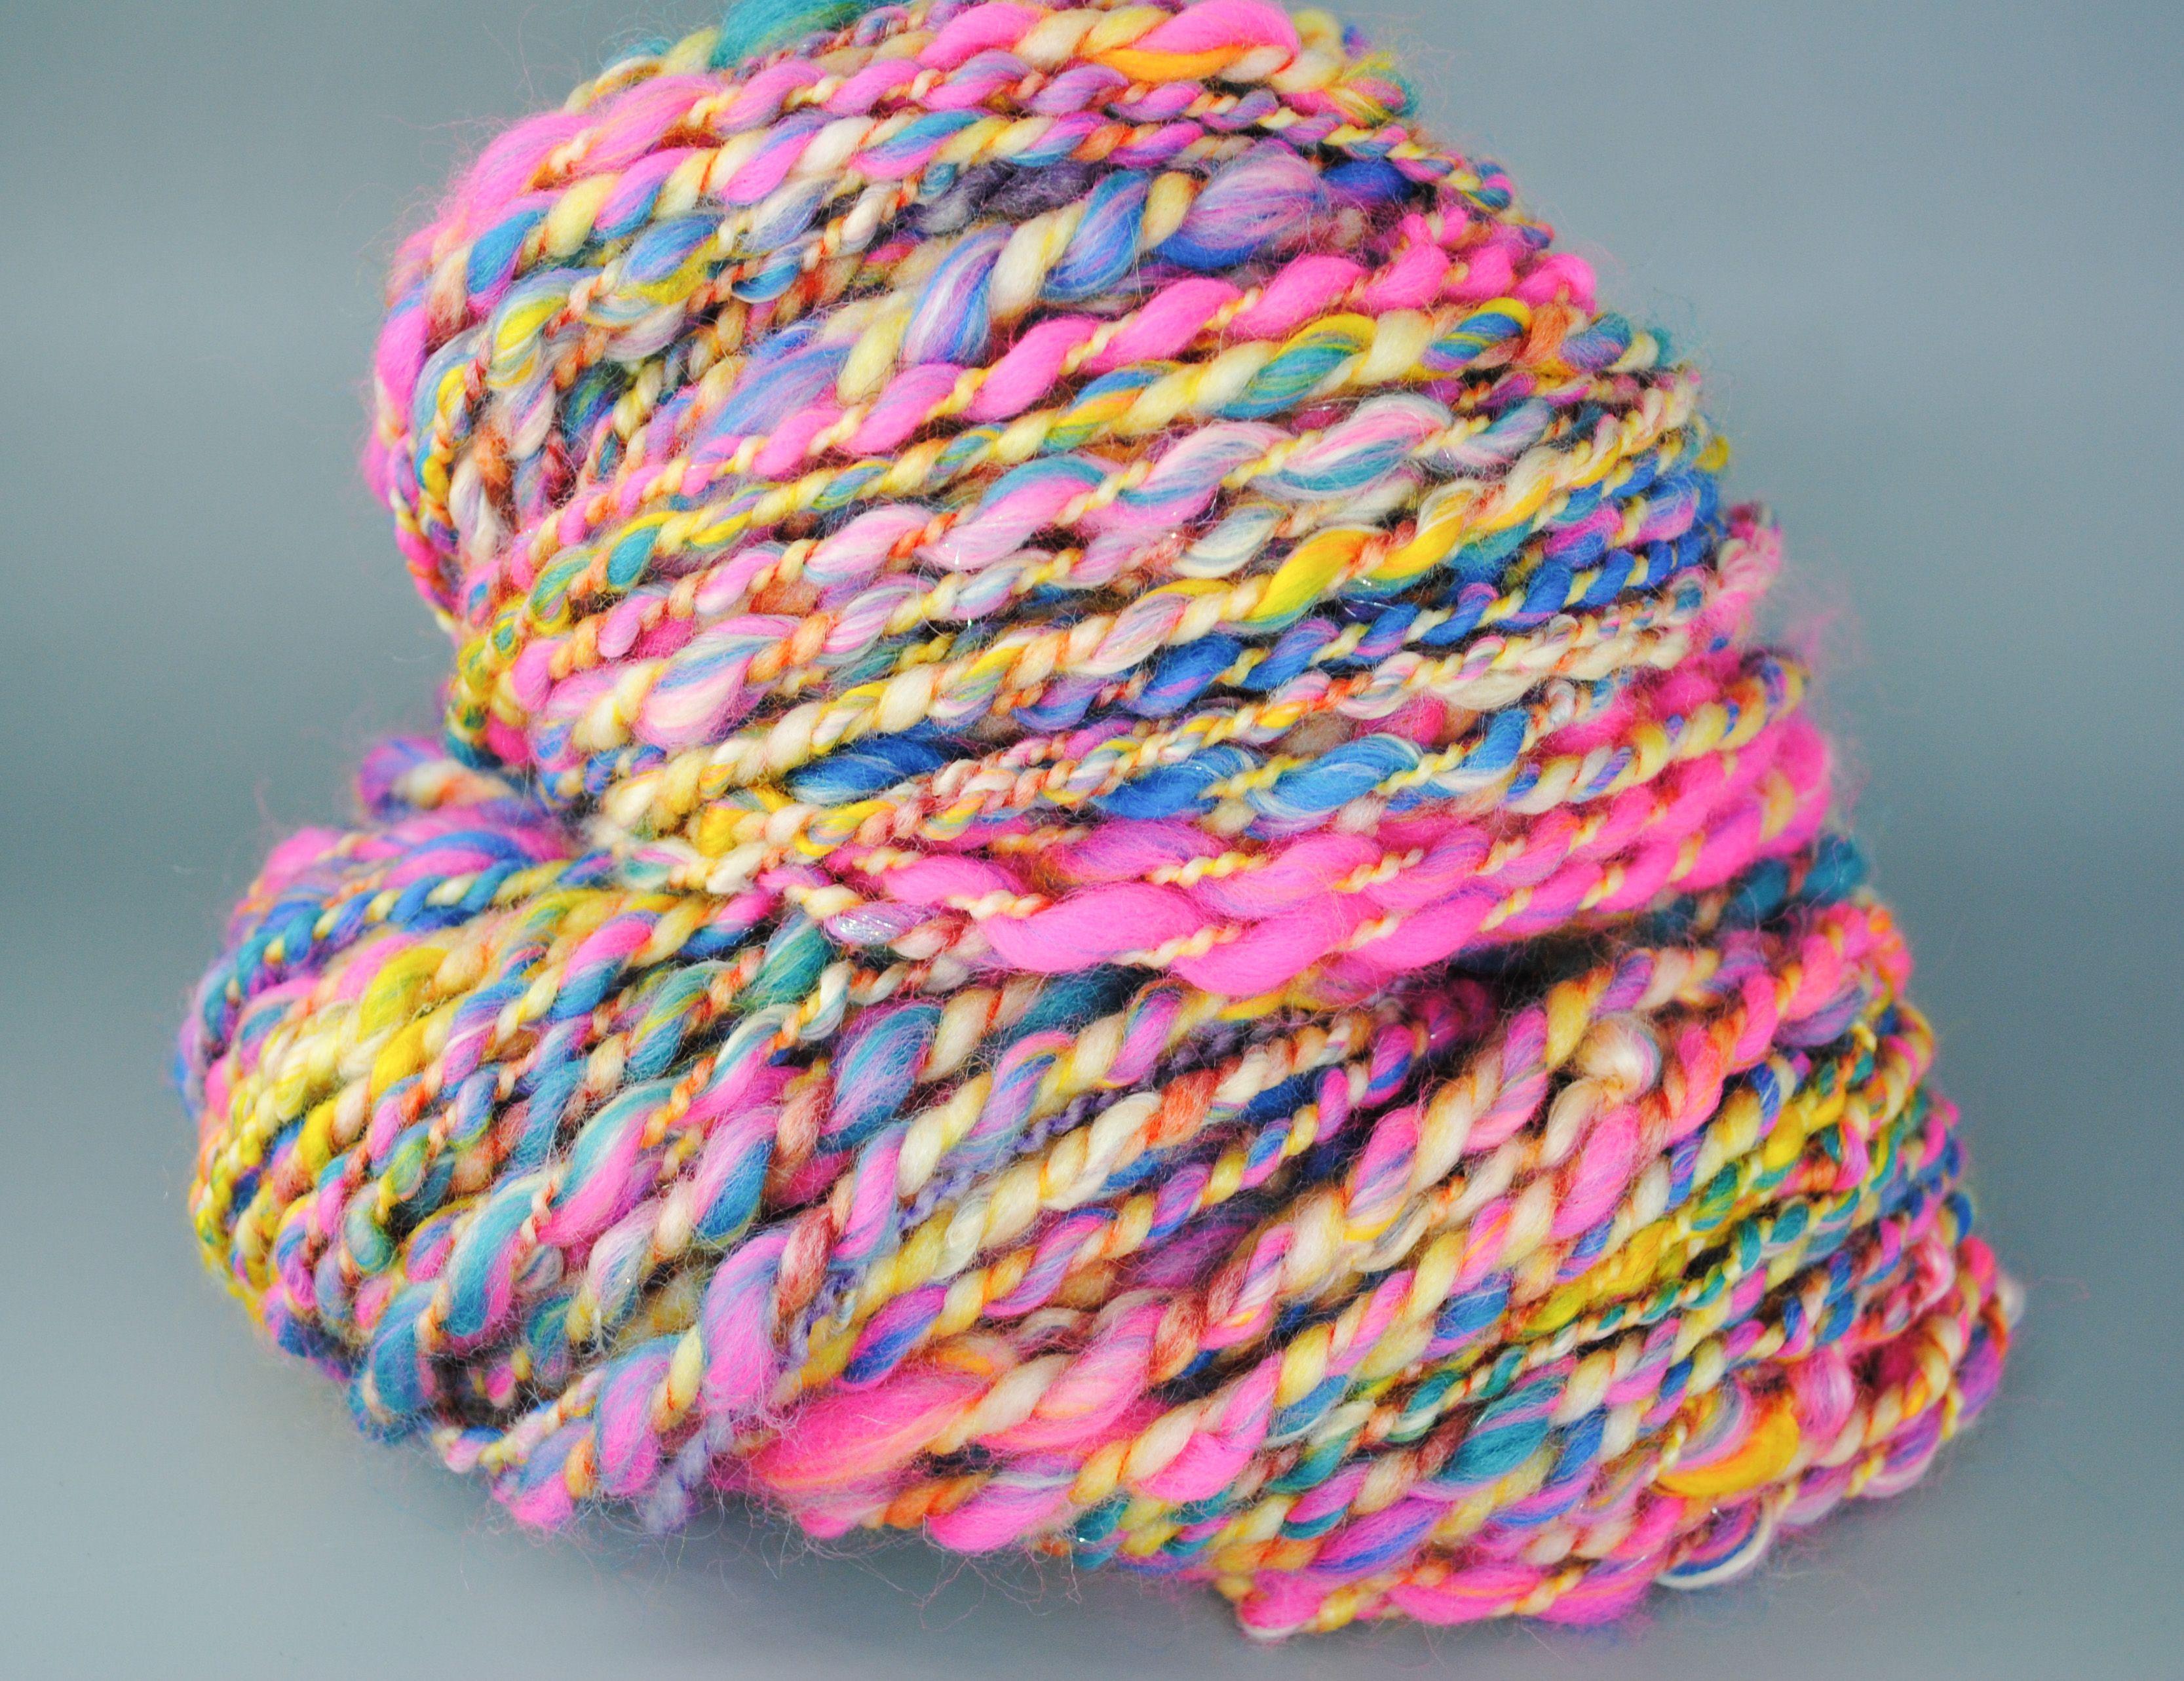 Cotton Candy Handspun Yarn For Knitting Crochet And